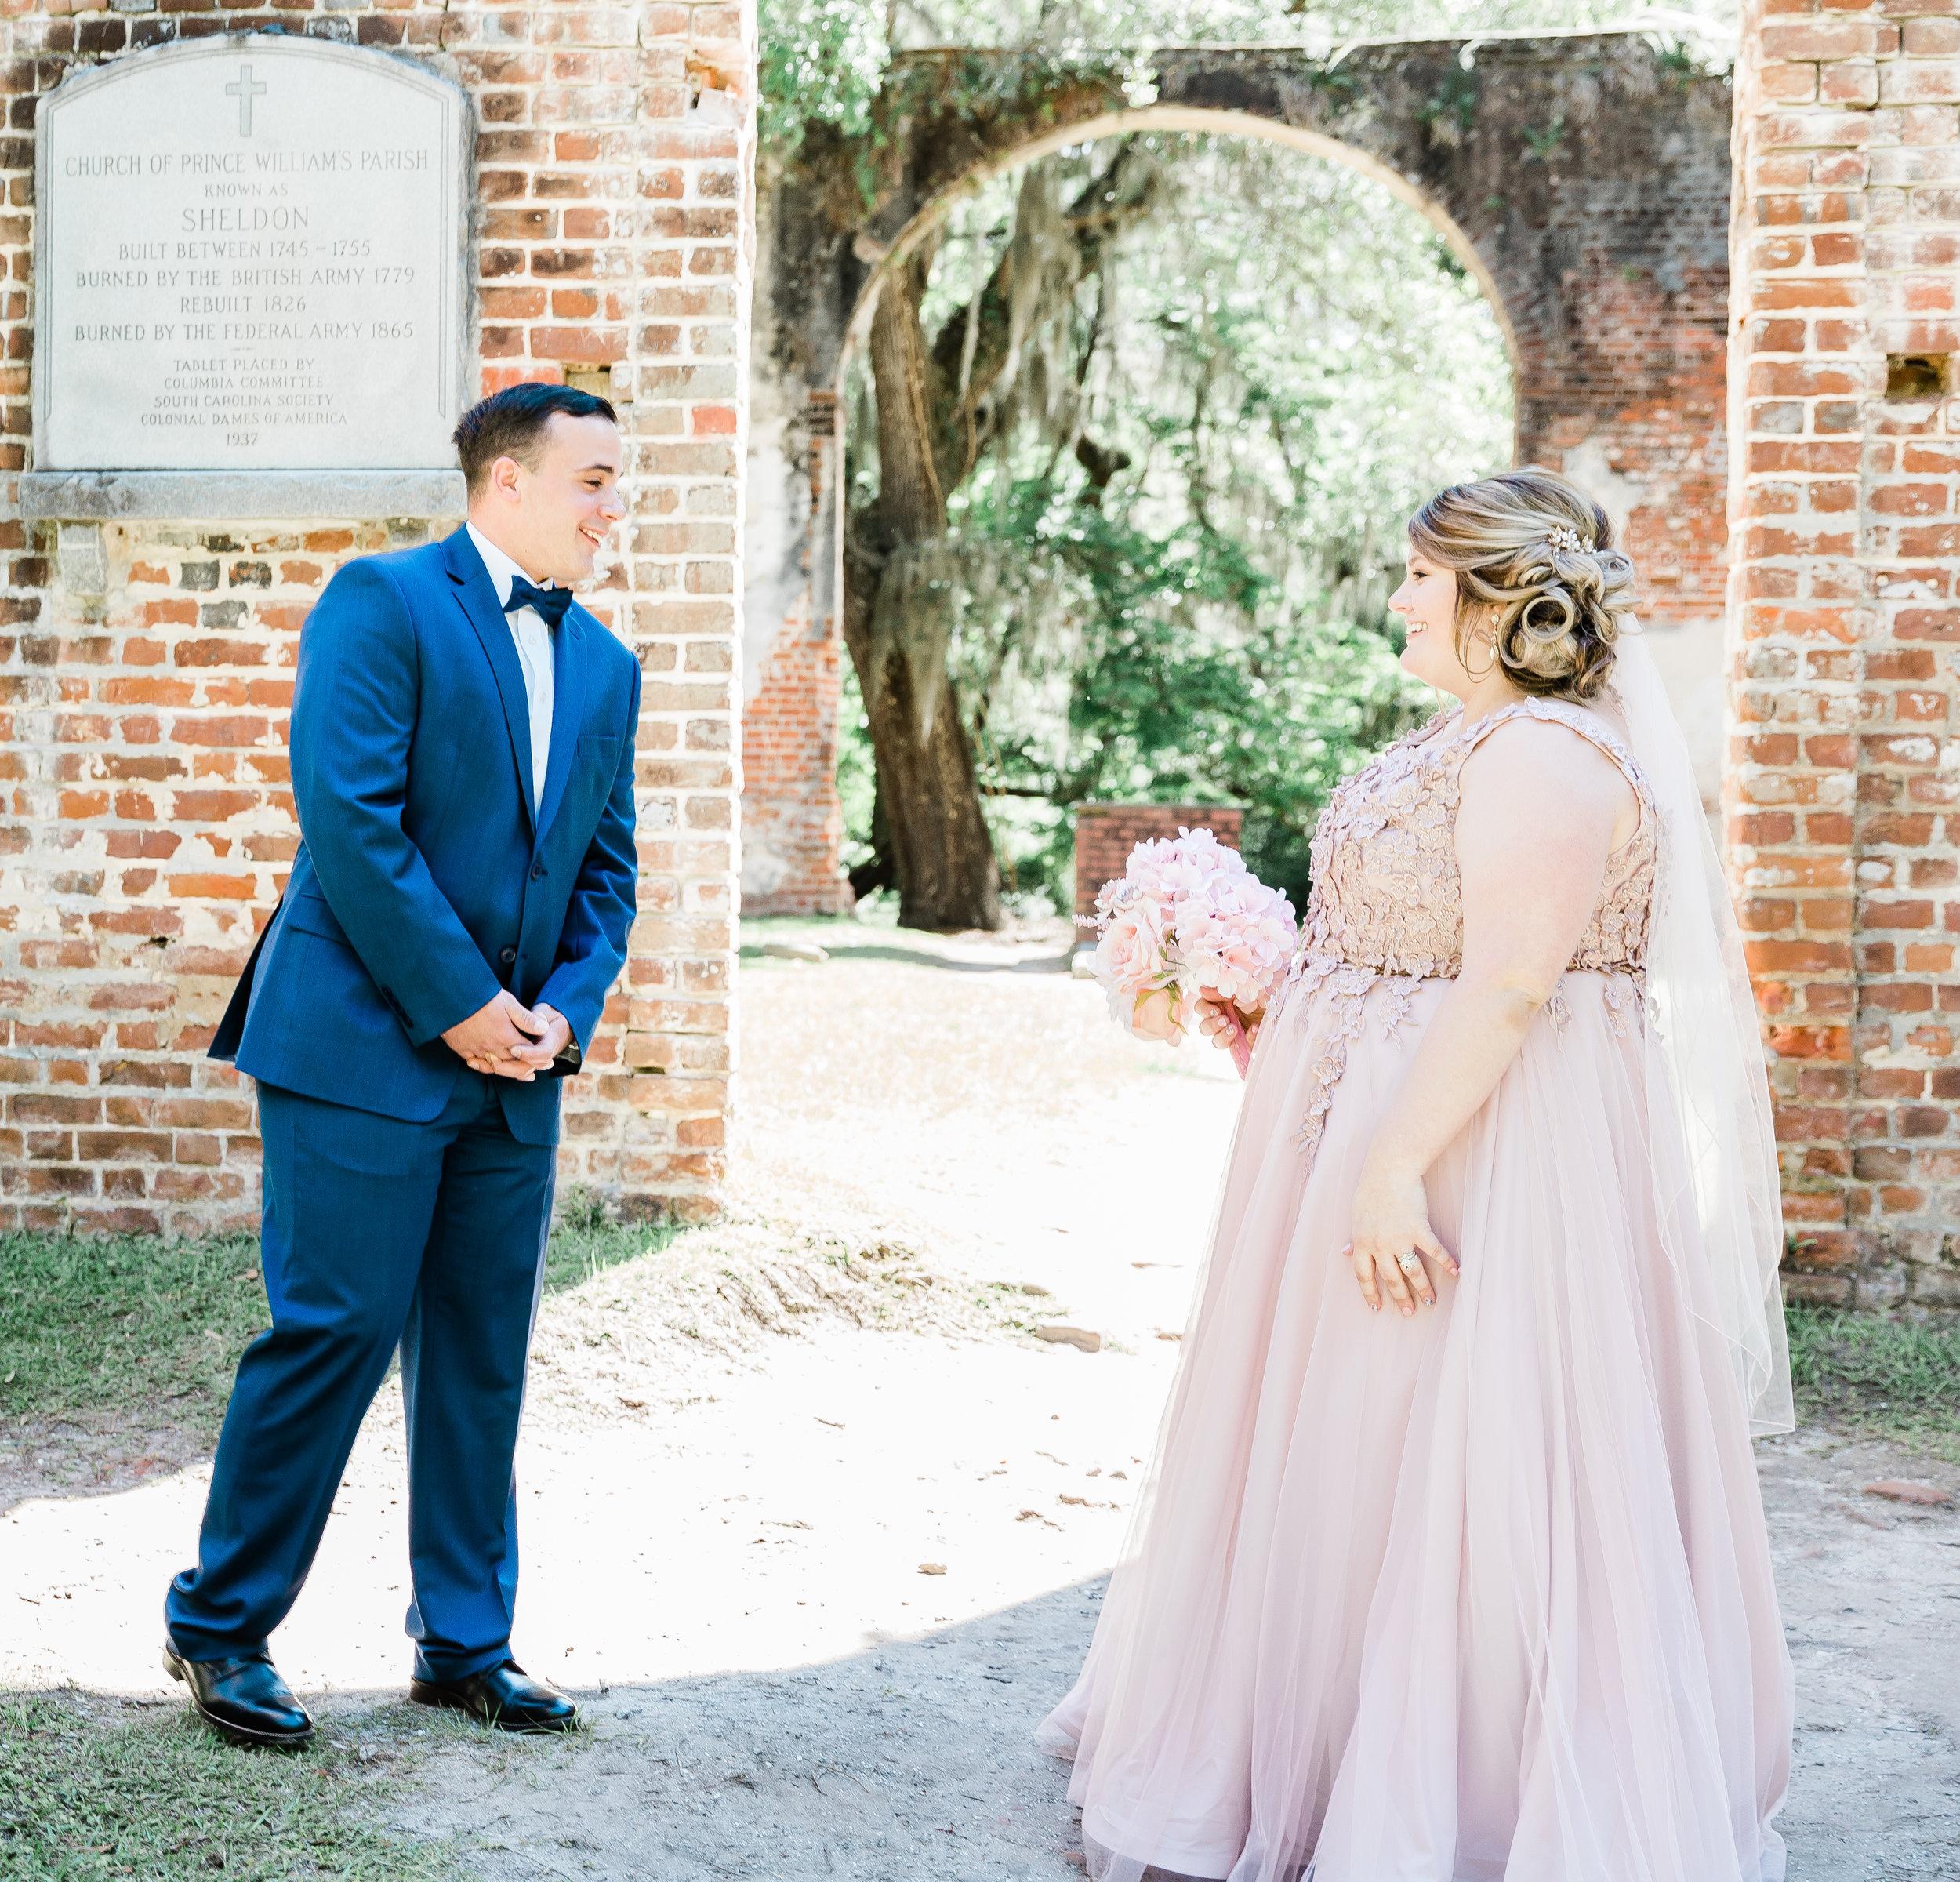 20190417-Southern Lens Photography-savannah family photographer- Ashley and Zack-old sheldon church ruins-201920.jpg